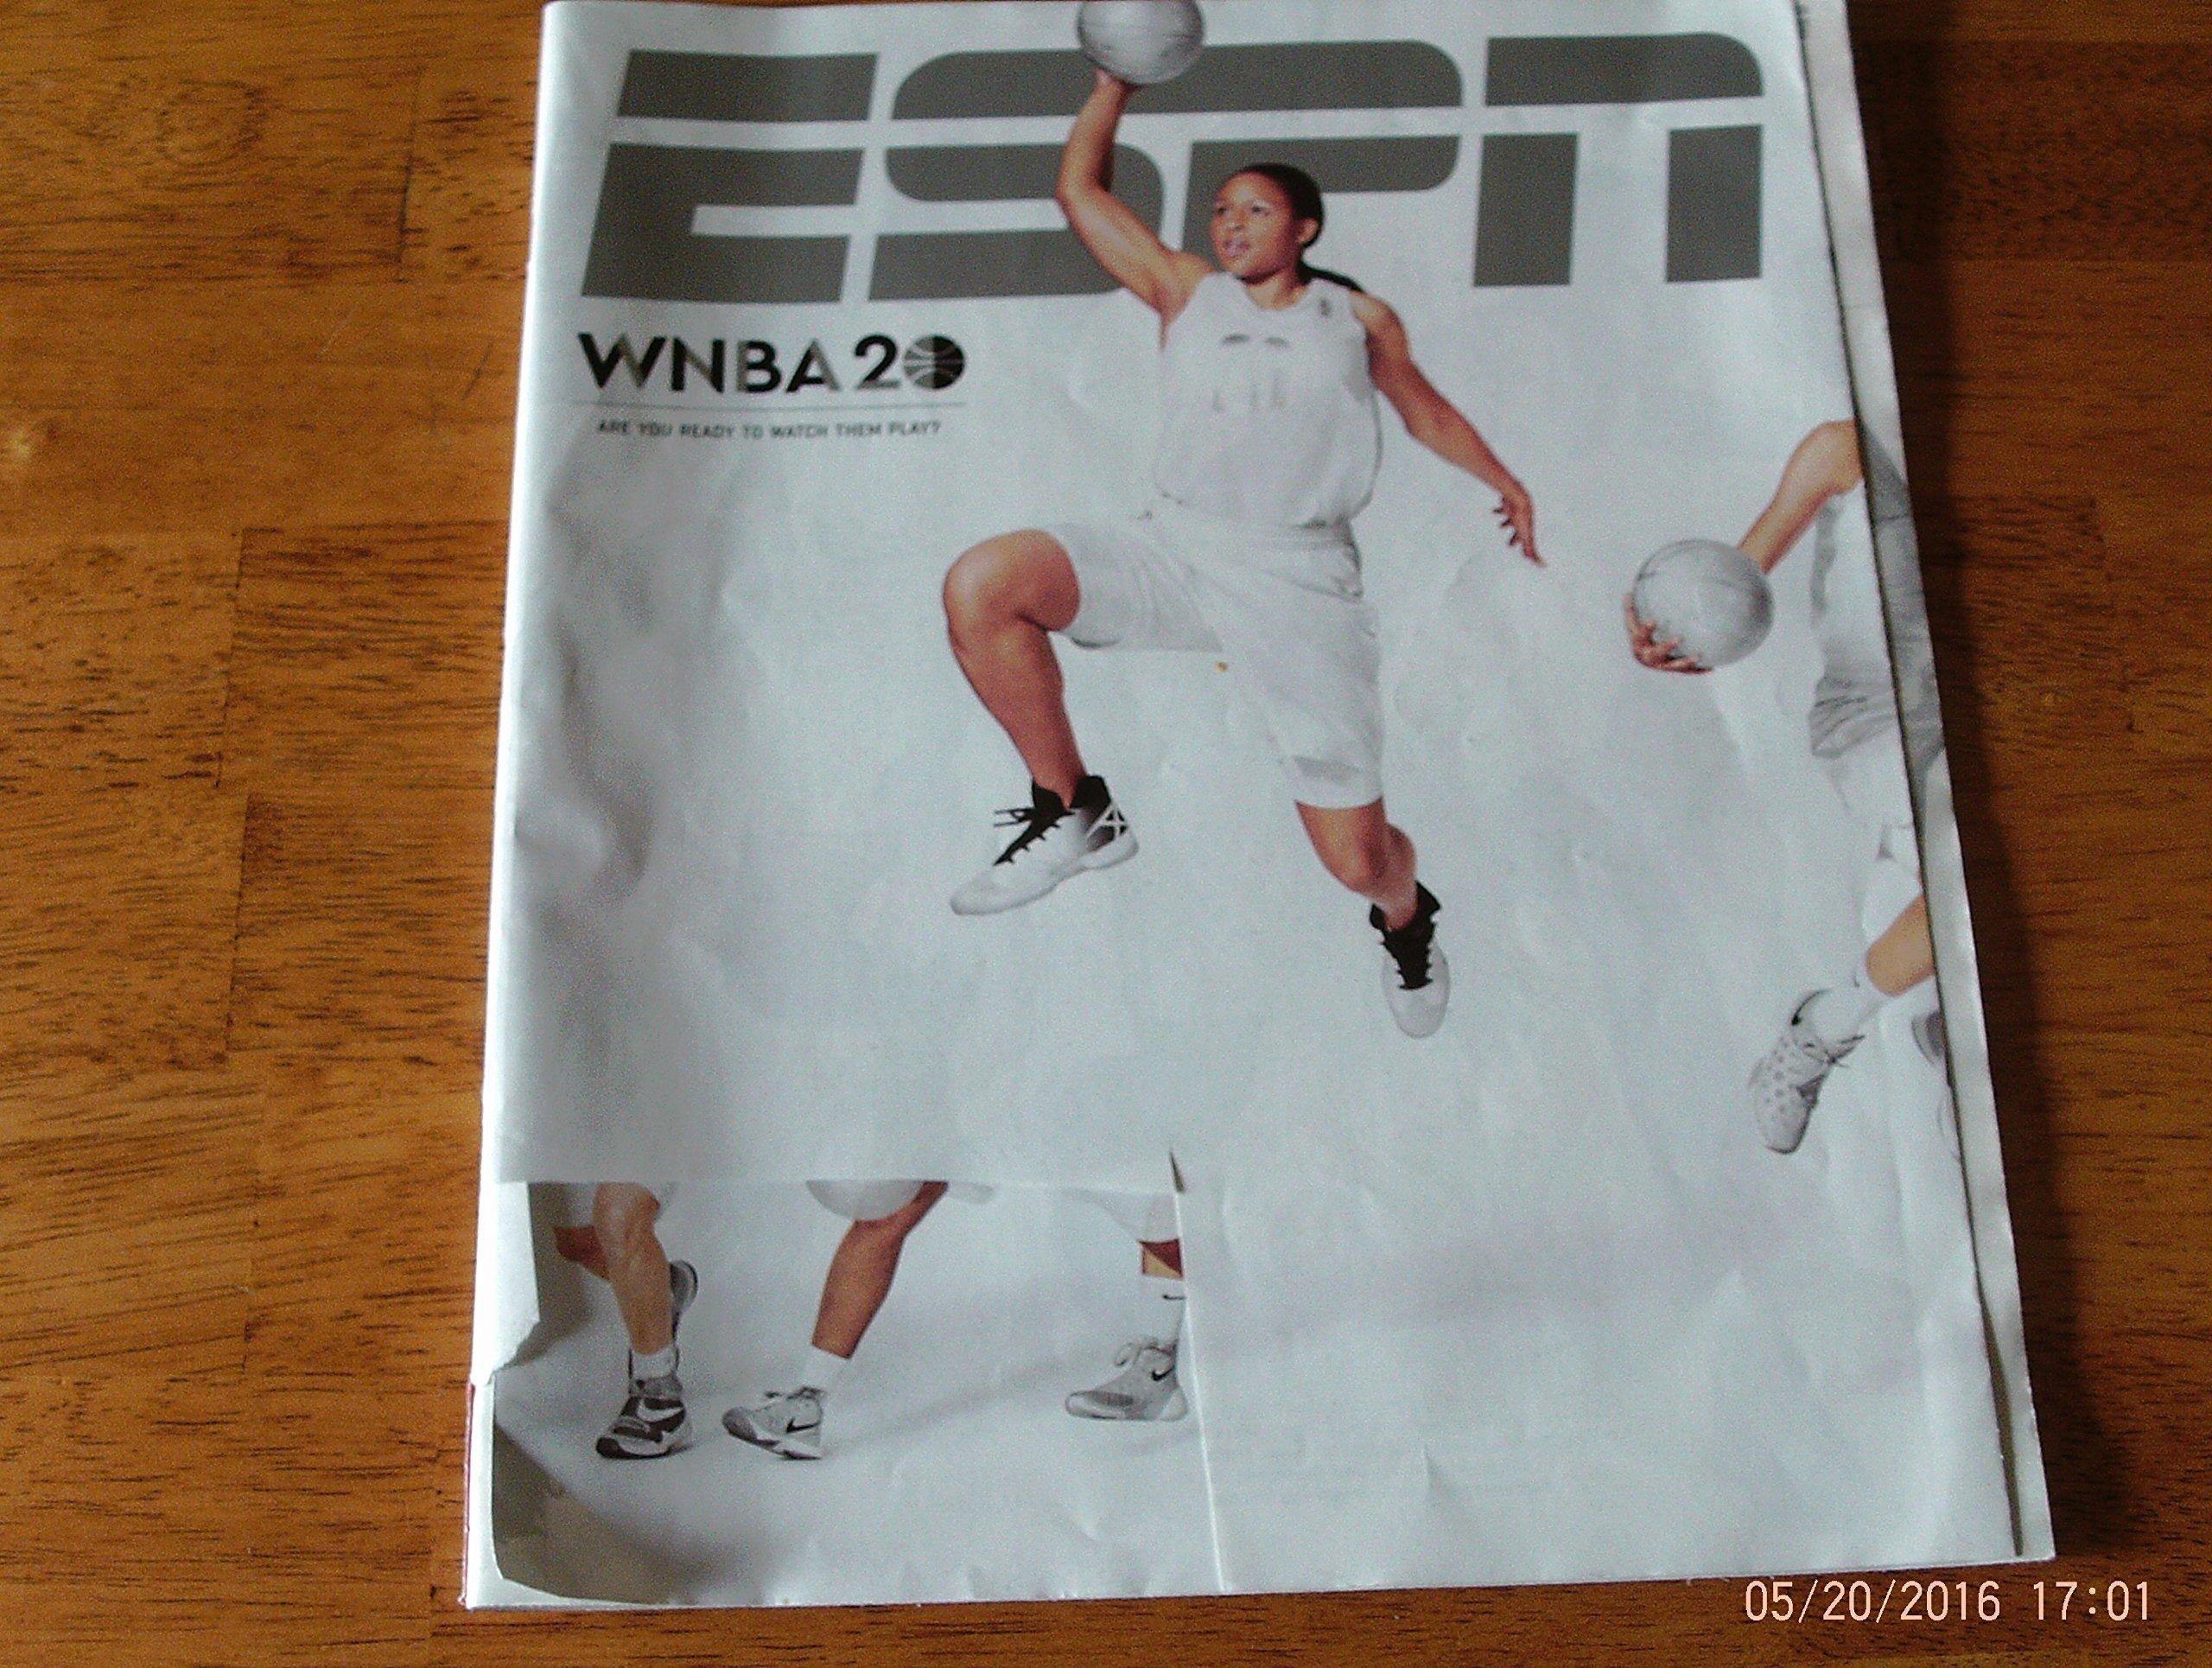 Read Online ESPN Magazine May 23, 2016 - WNBA 20 Issue pdf